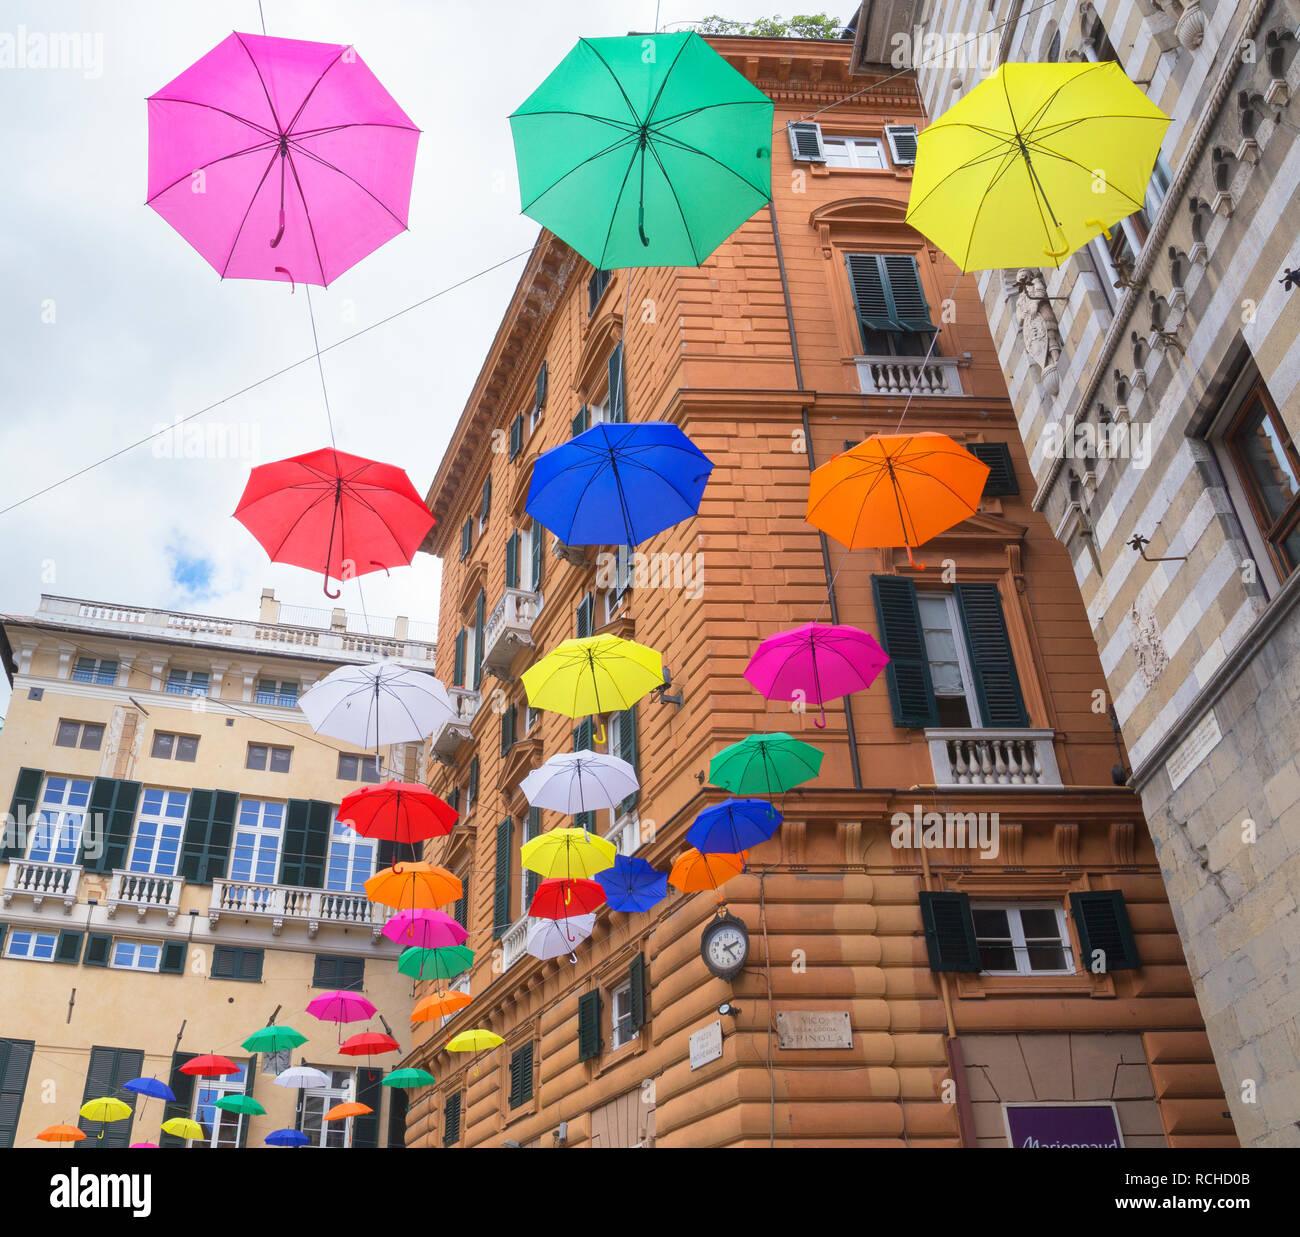 Bunte schwebende Schirme, Genua, Ligurien, Italien, Europa Stockbild